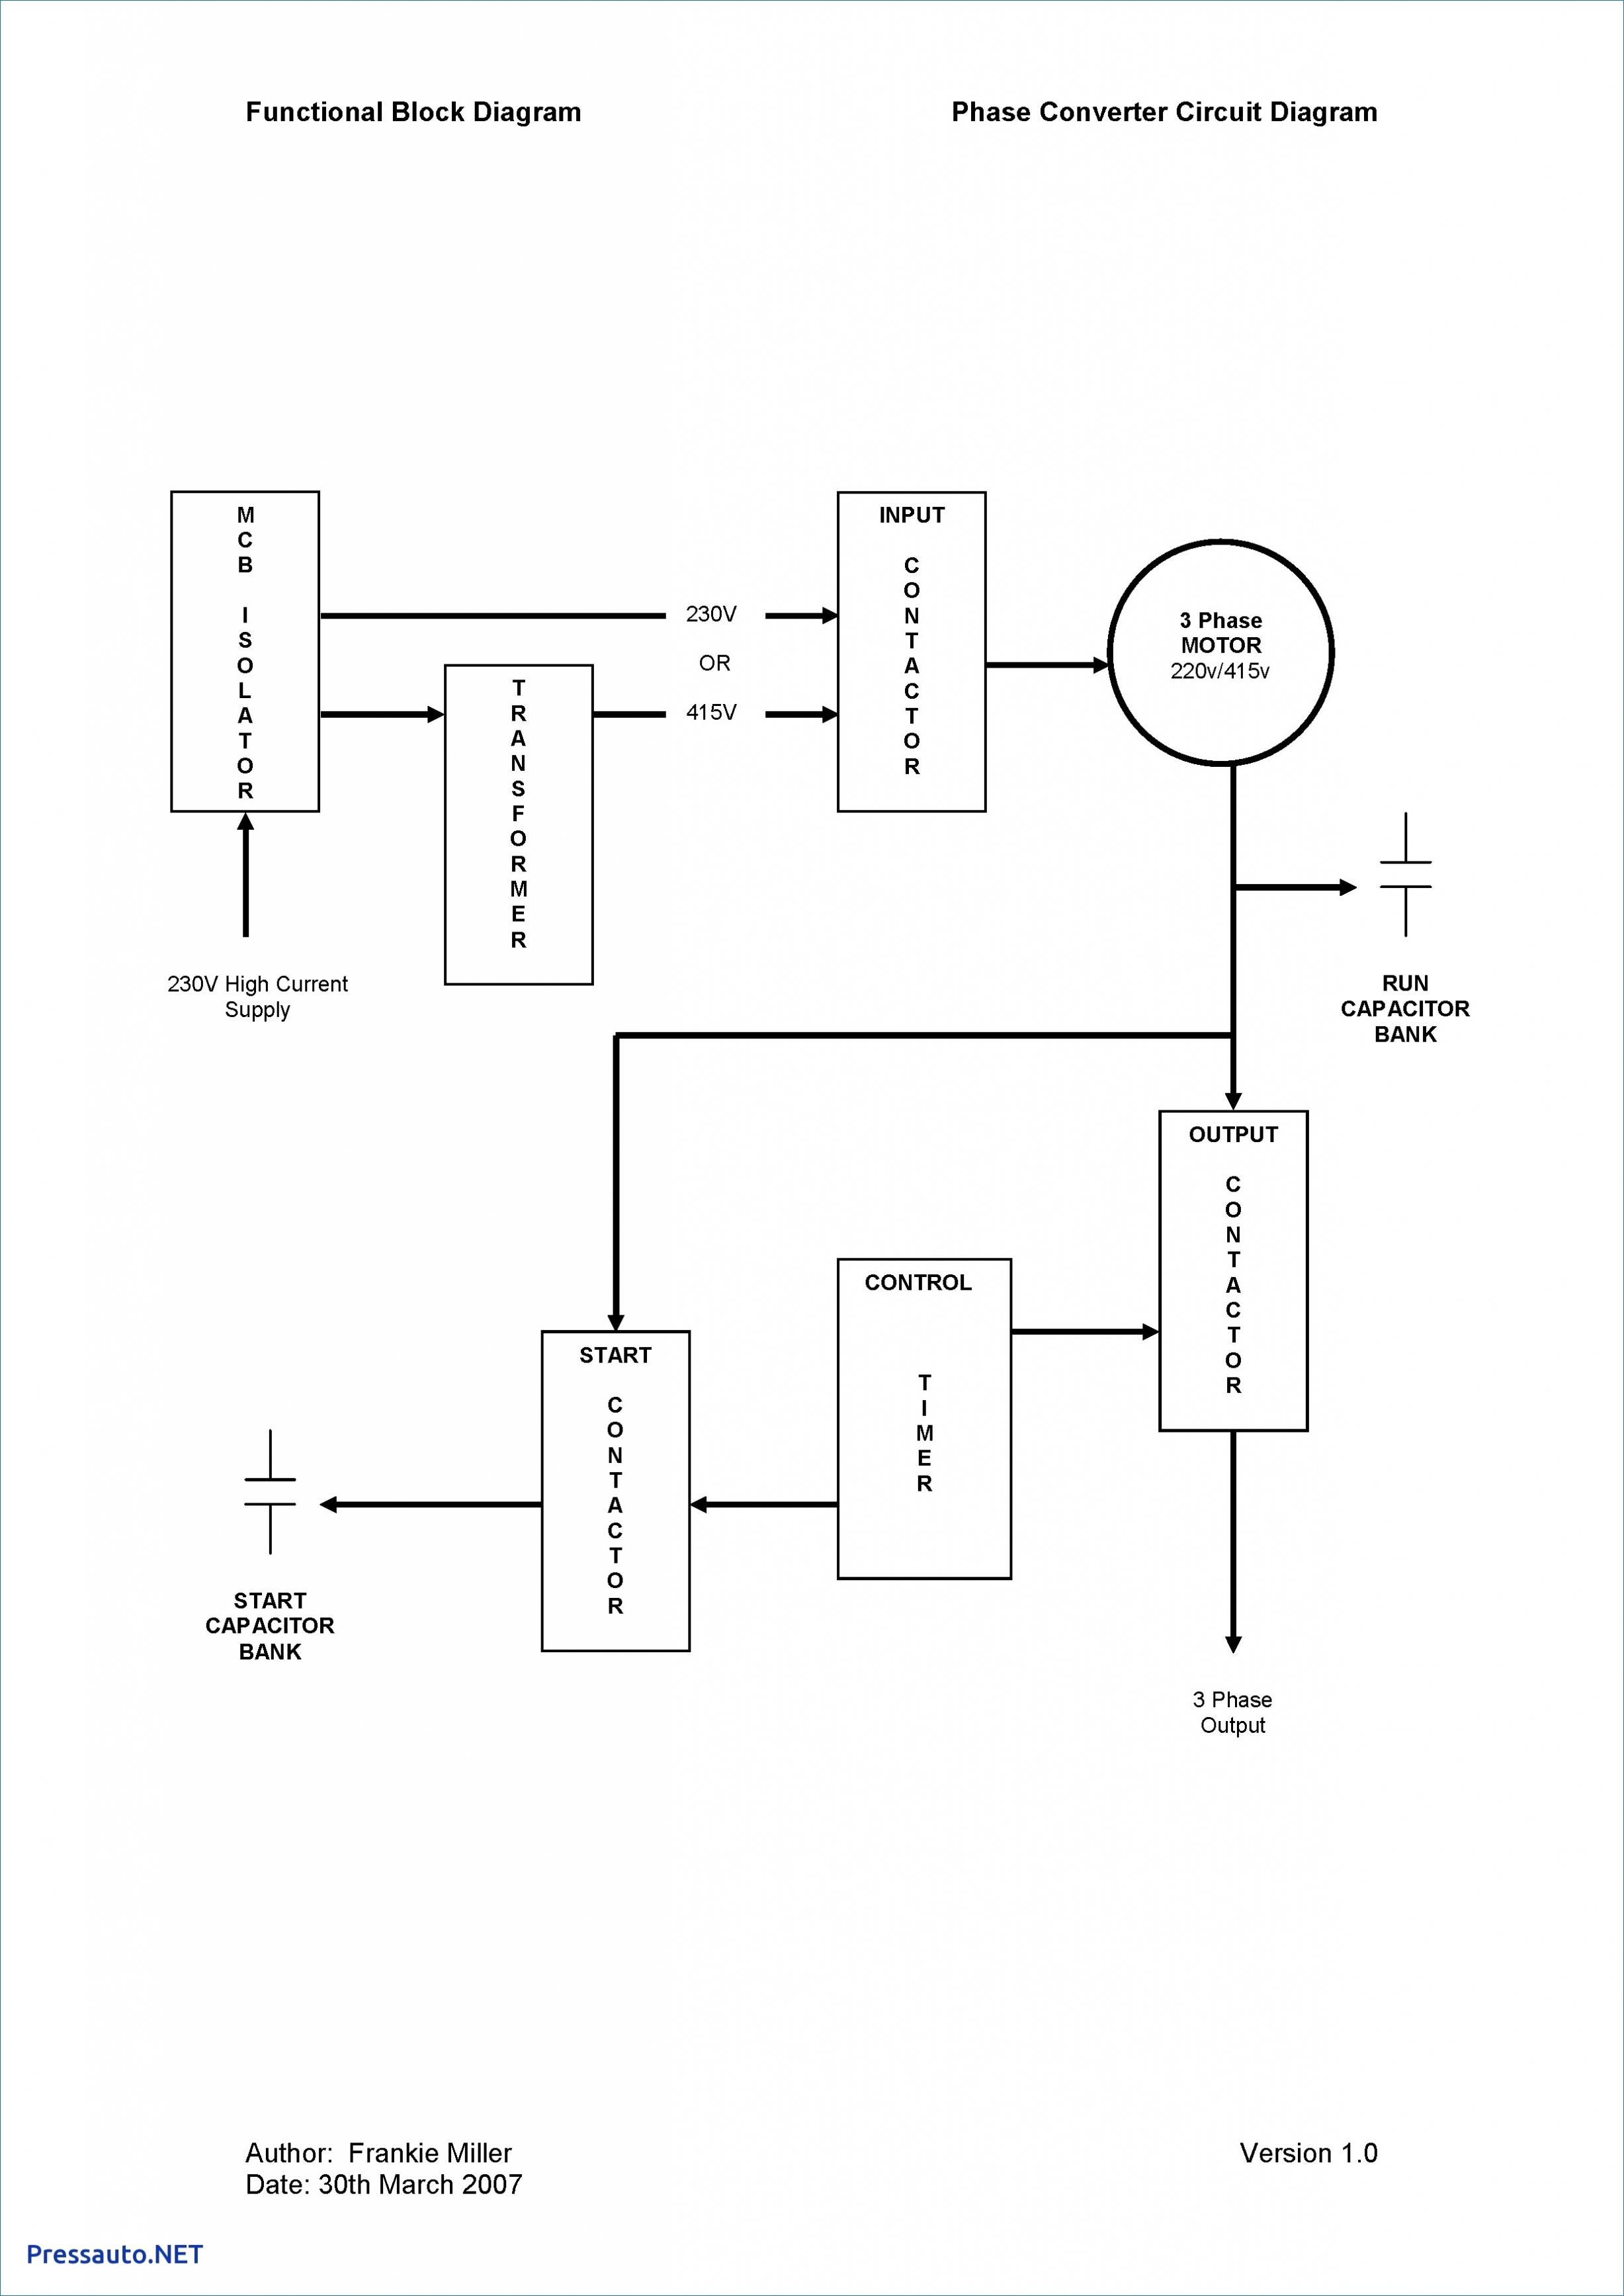 220V Wiring Diagram | Wiring Library - 220V Wiring Diagram